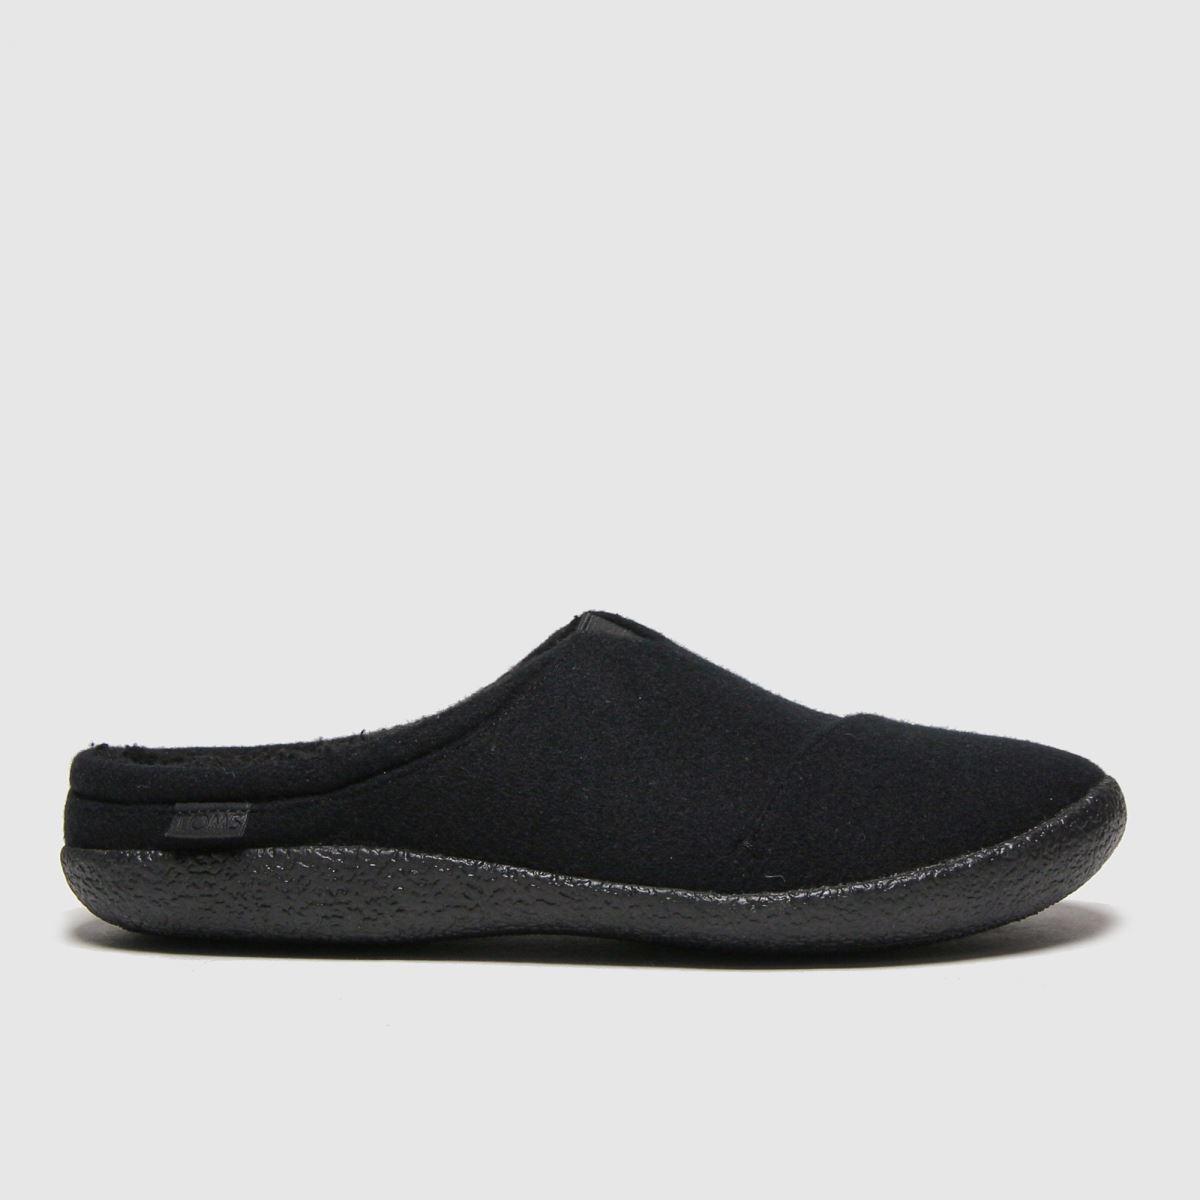 TOMS Black Berkeley Slippers